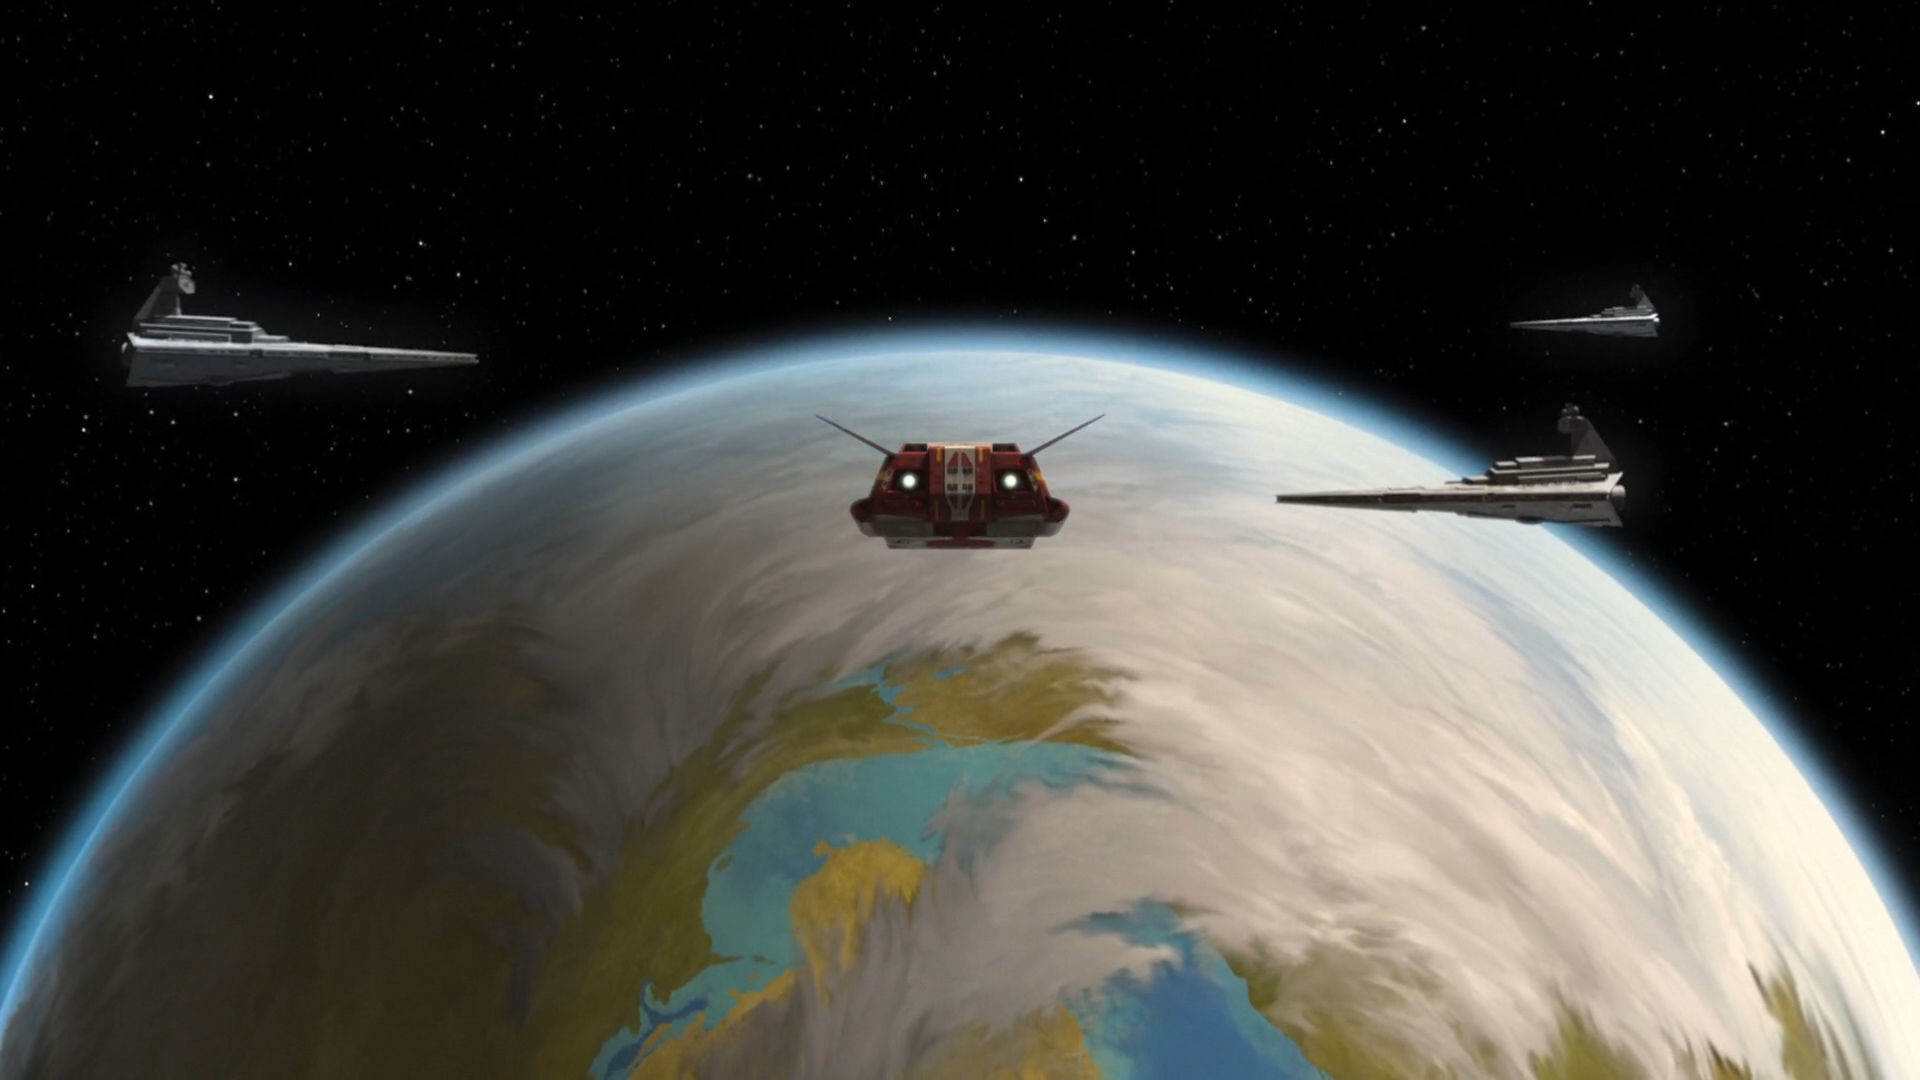 TV Show – Star Wars Rebels Wallpaper